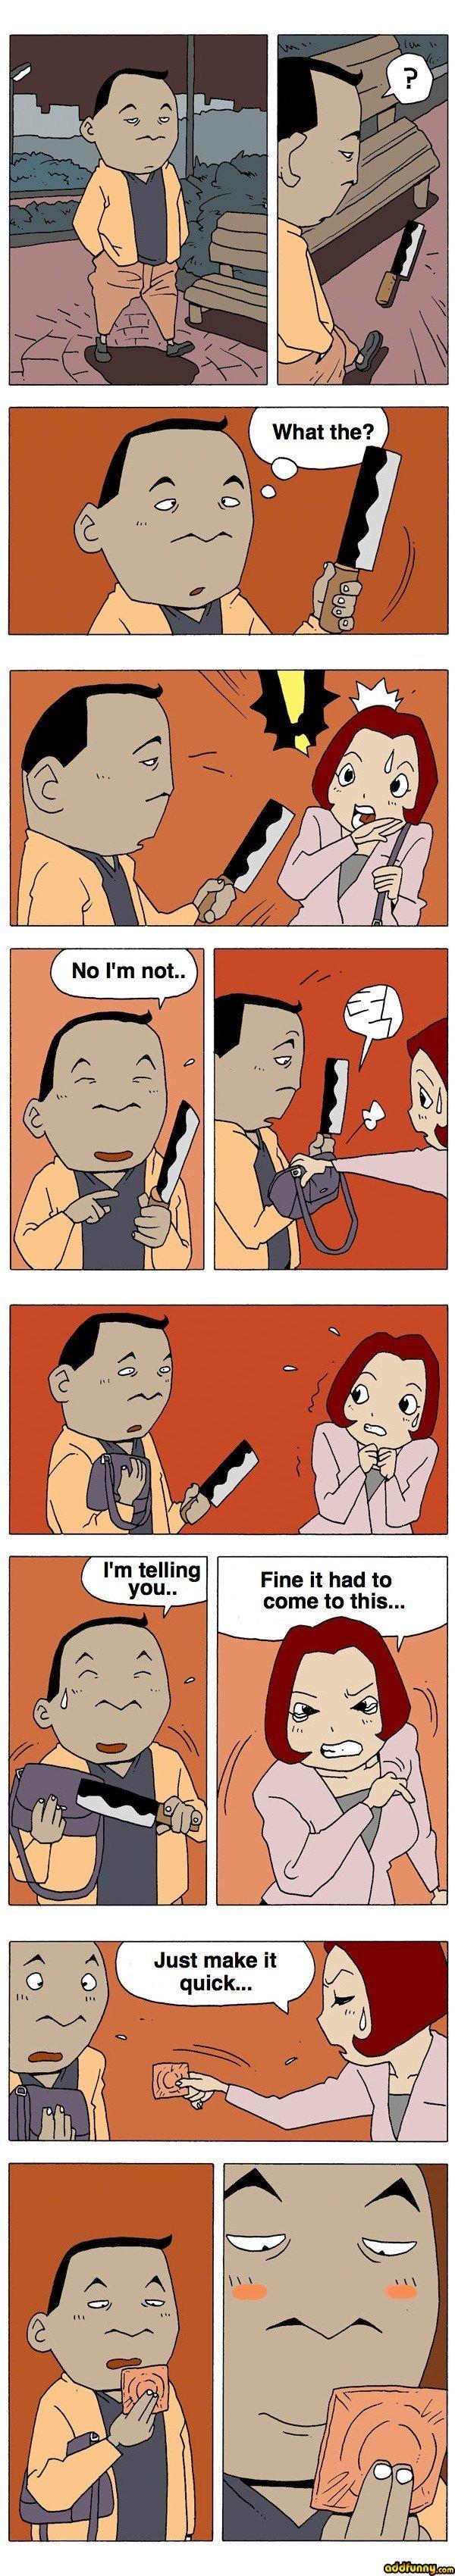 Korean Comic. Not mine, but funny.